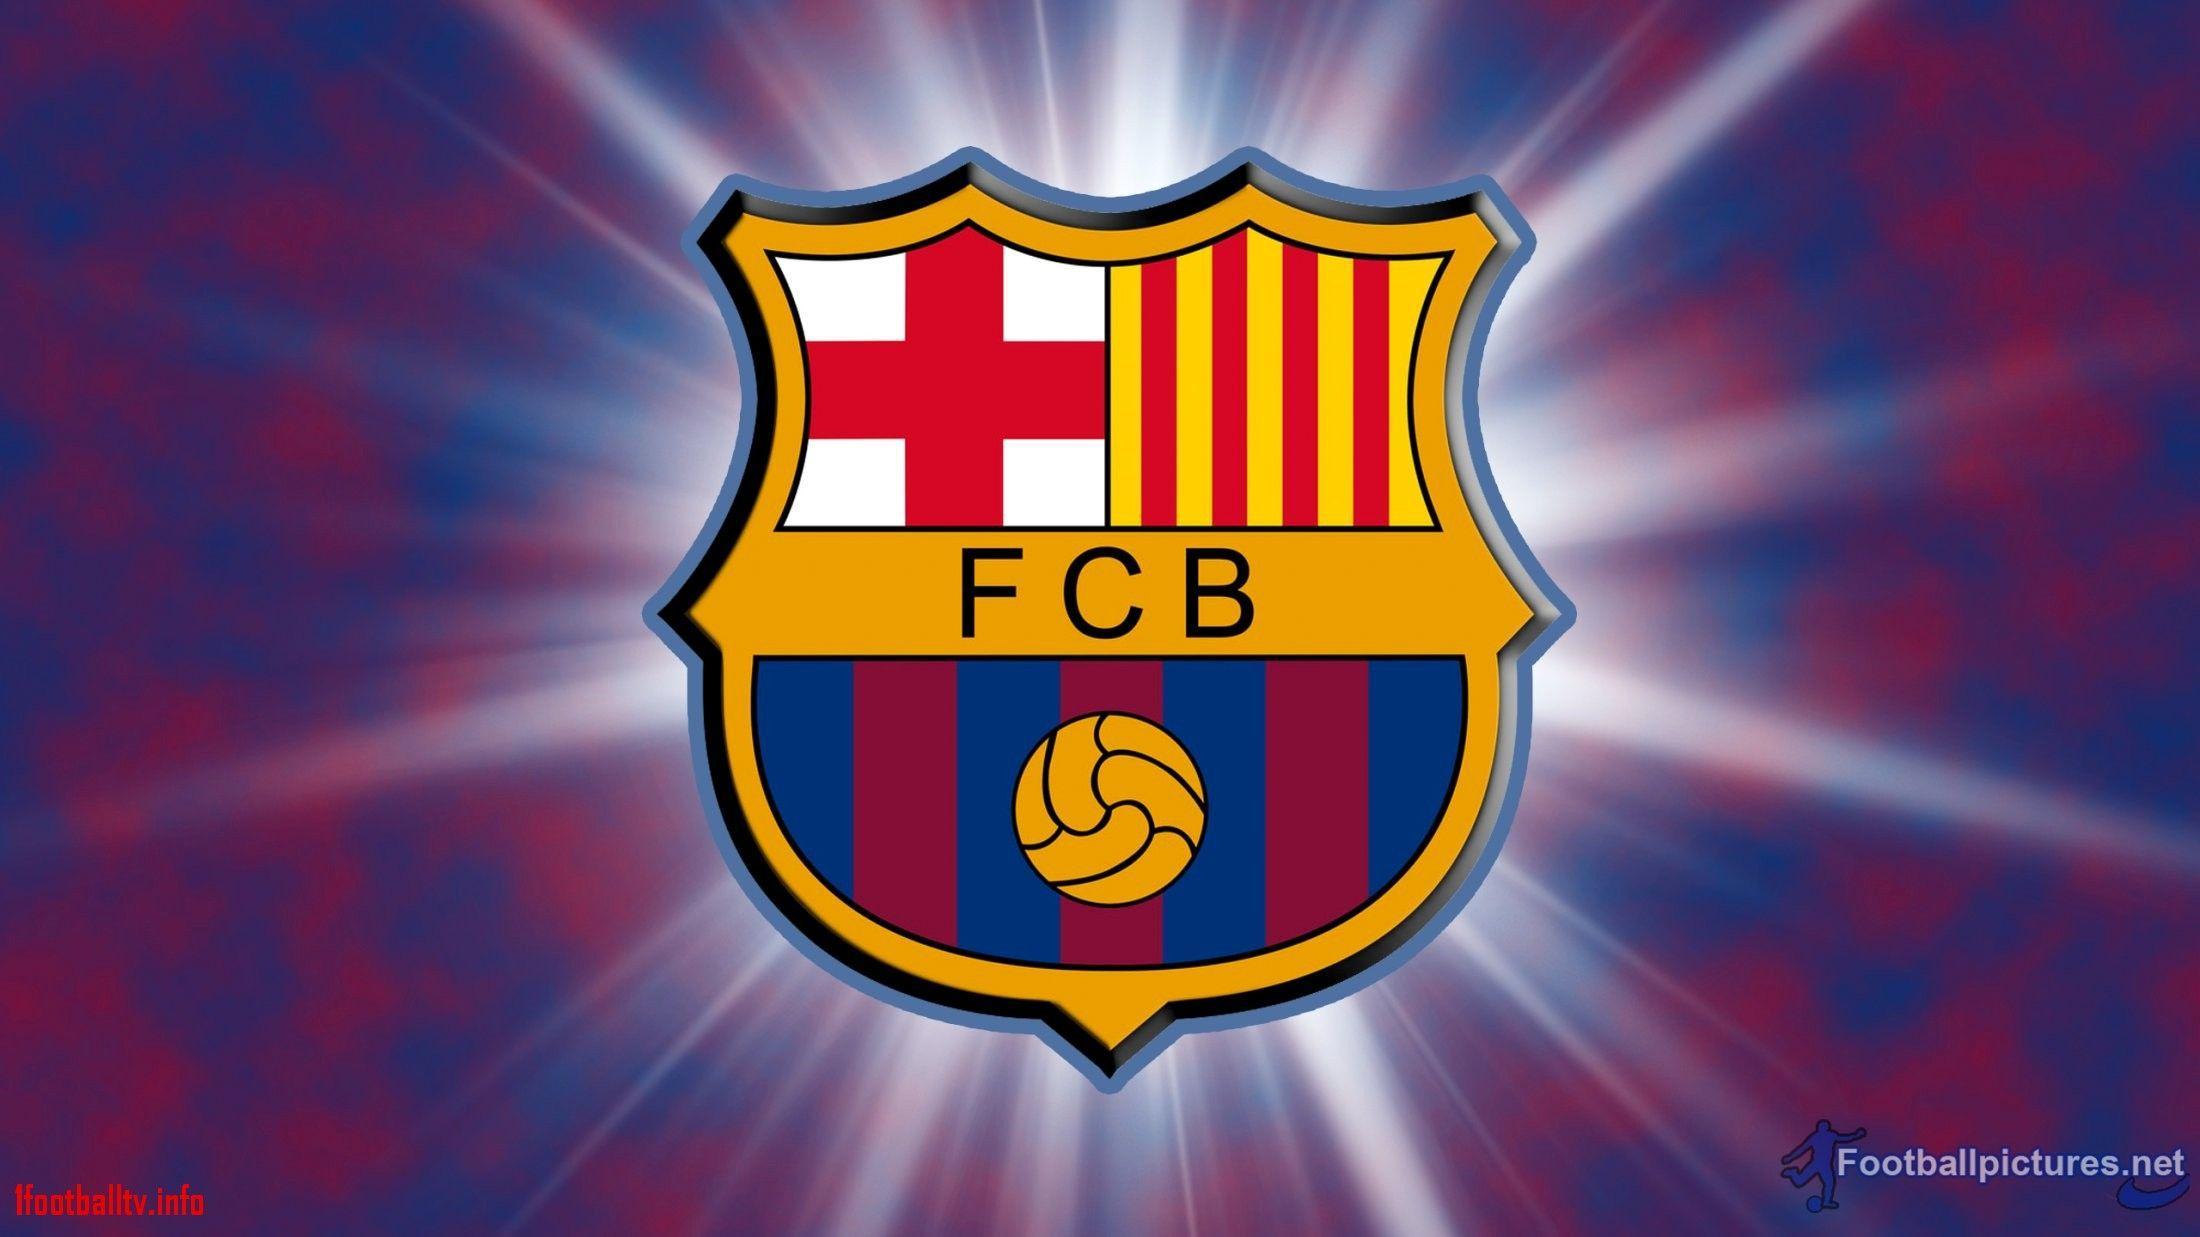 barcelona wallpapers top free barcelona backgrounds wallpaperaccess barcelona wallpapers top free